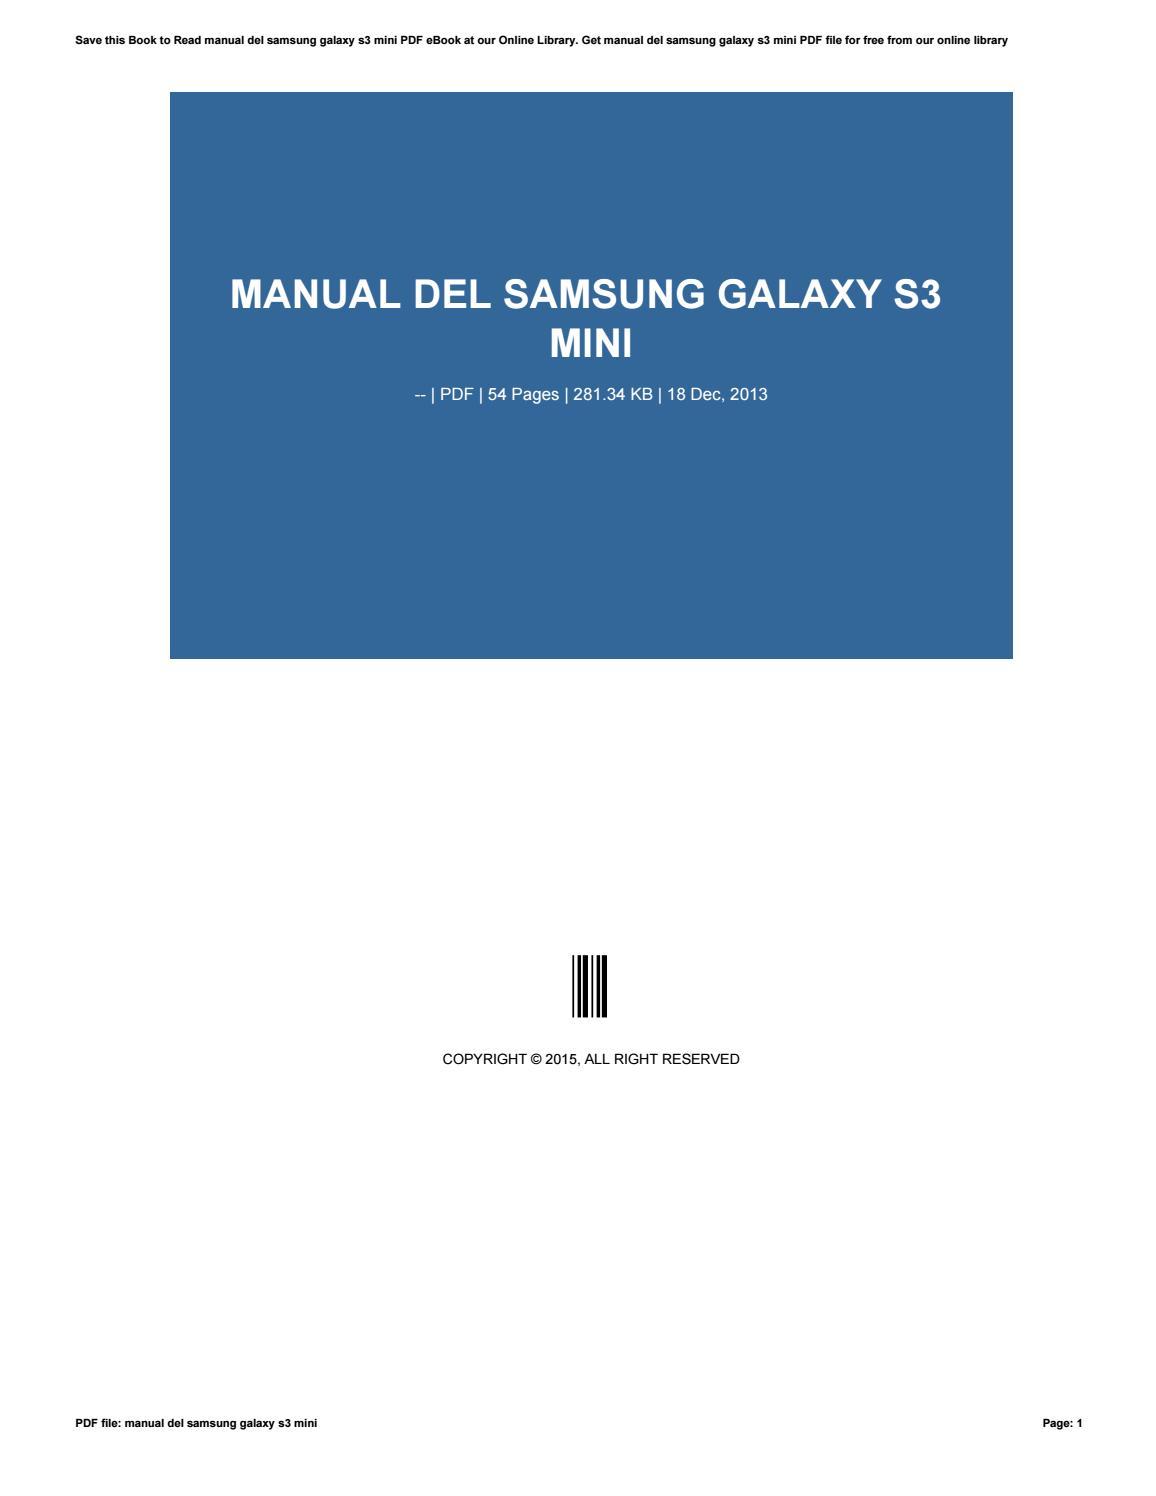 manual del samsung galaxy s3 mini by successlocation26 issuu rh issuu com Samsung Galaxy S3 Manual AT&T samsung galaxy s3 instruction book